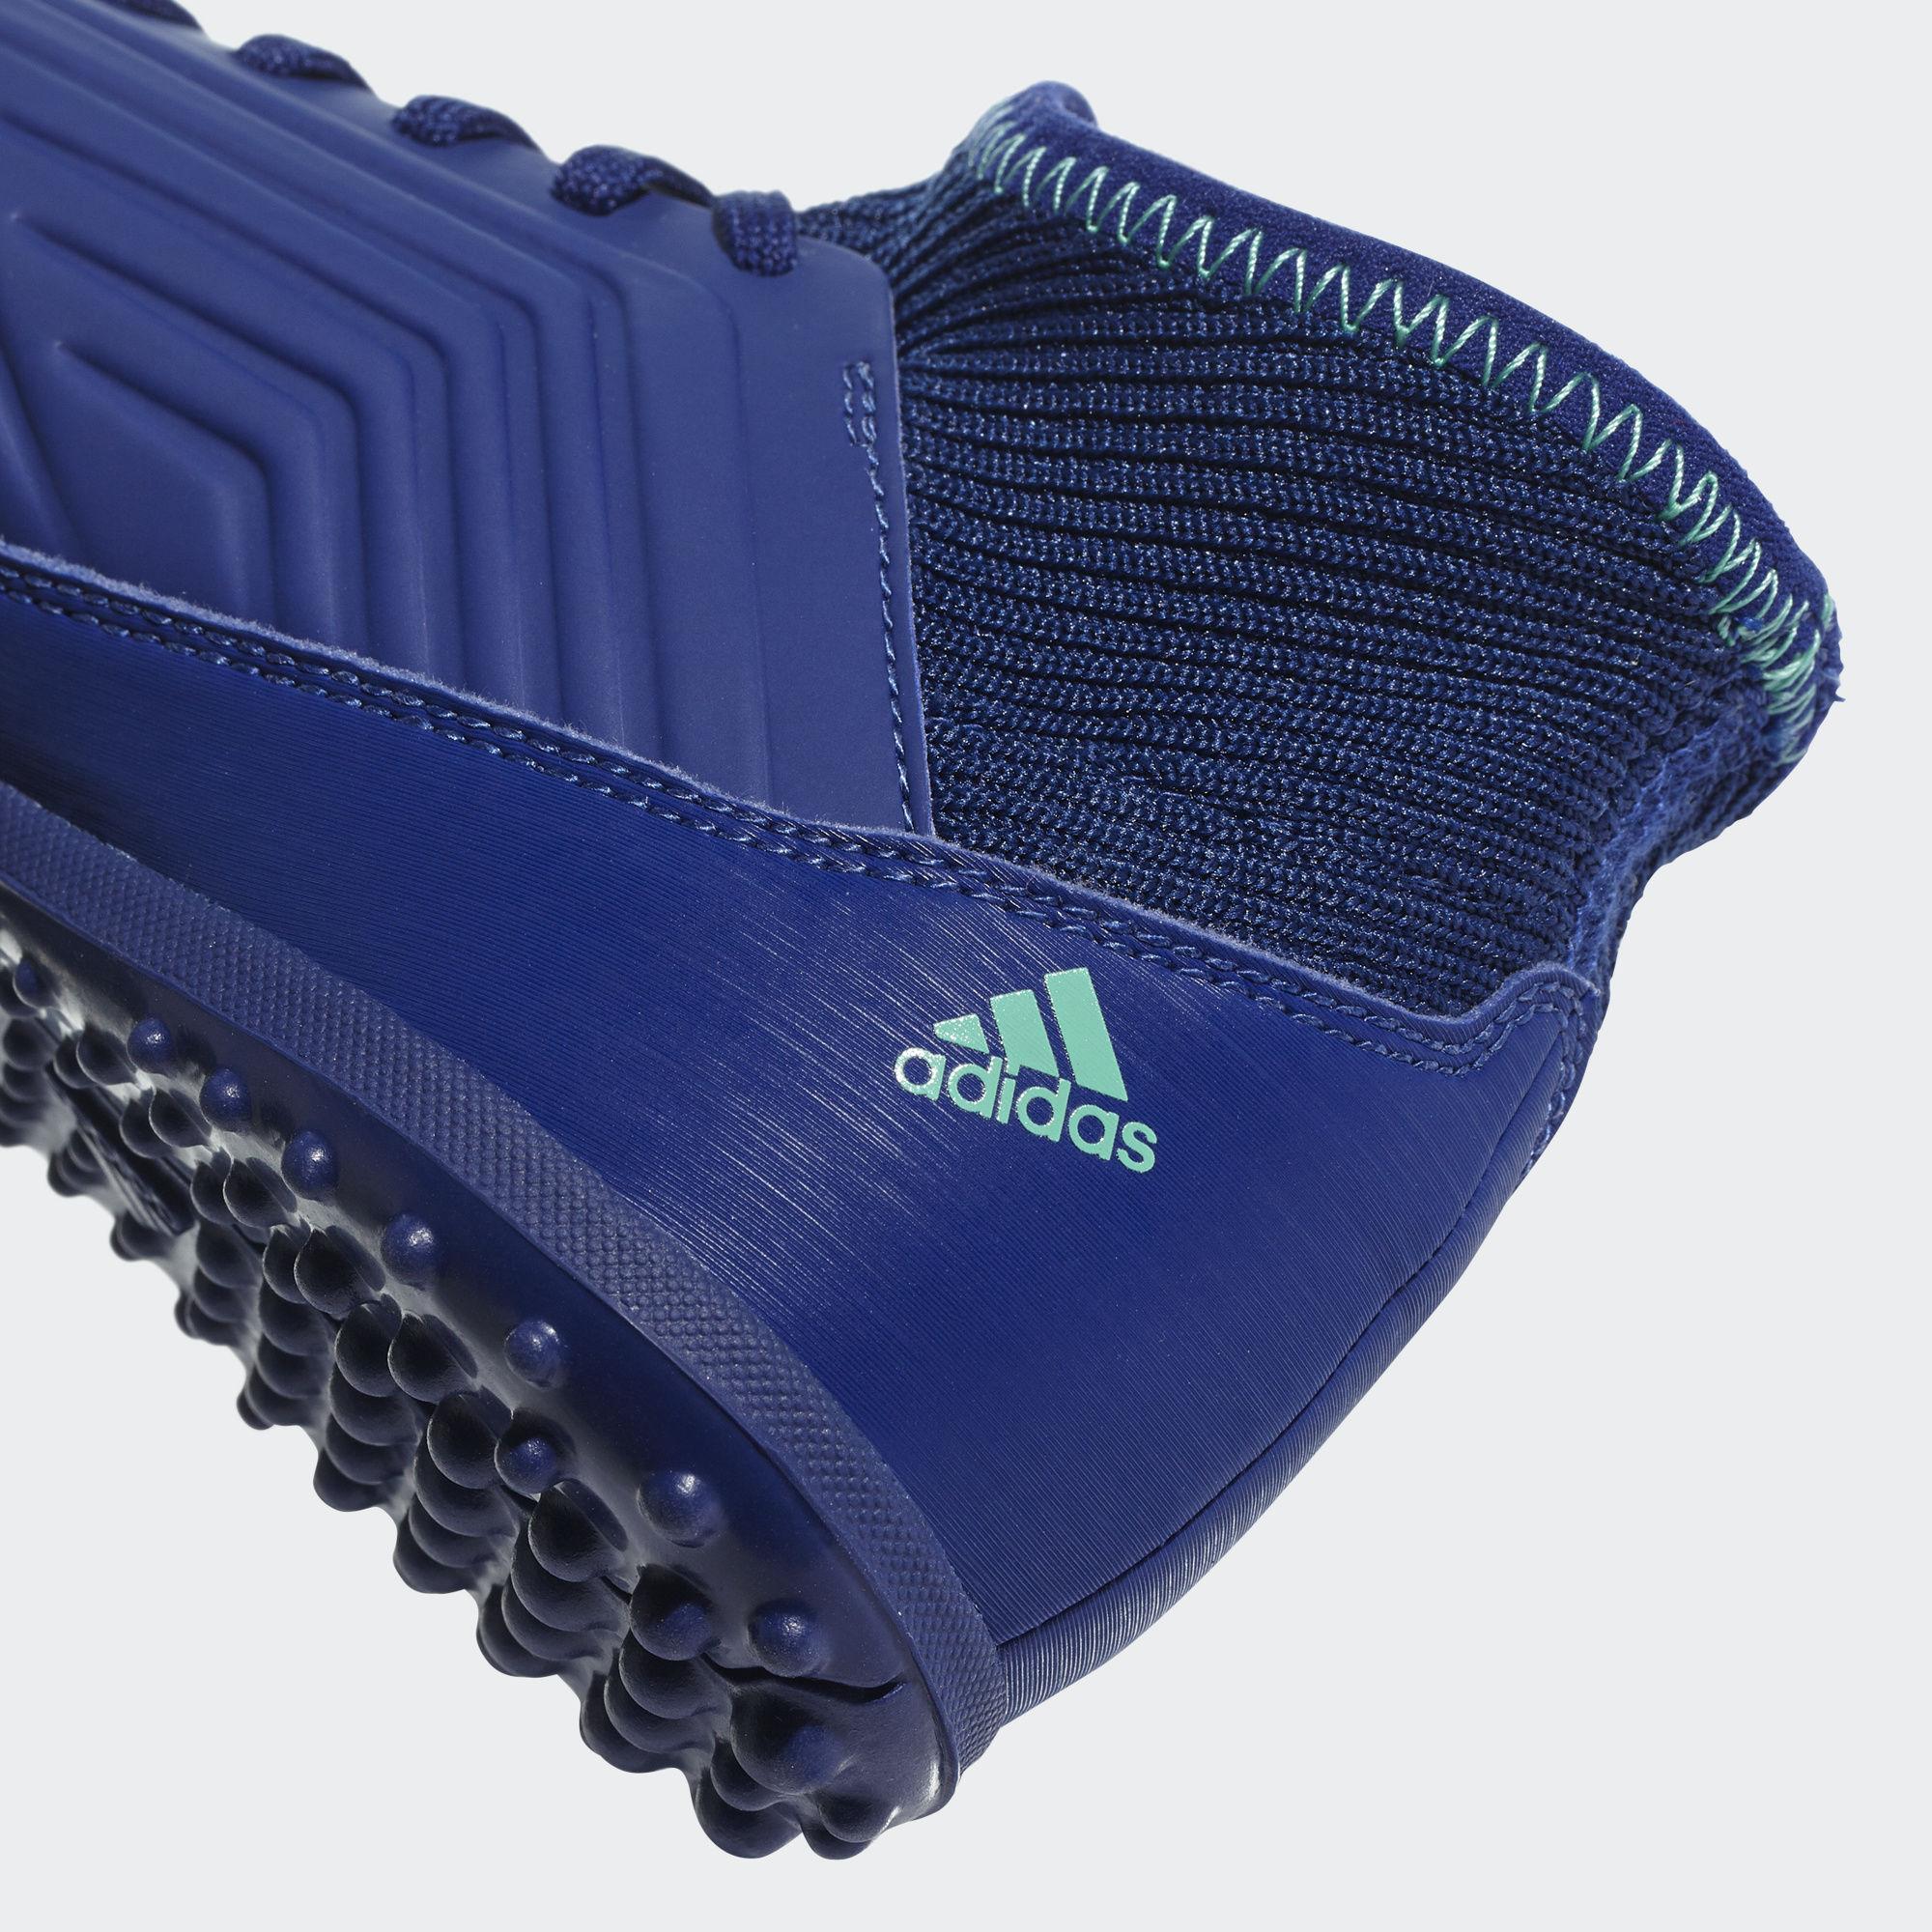 Футбольные бутсы Predator Tango 18.3 TF K CP9042 adidas Performance ... 5a2f4ebf02